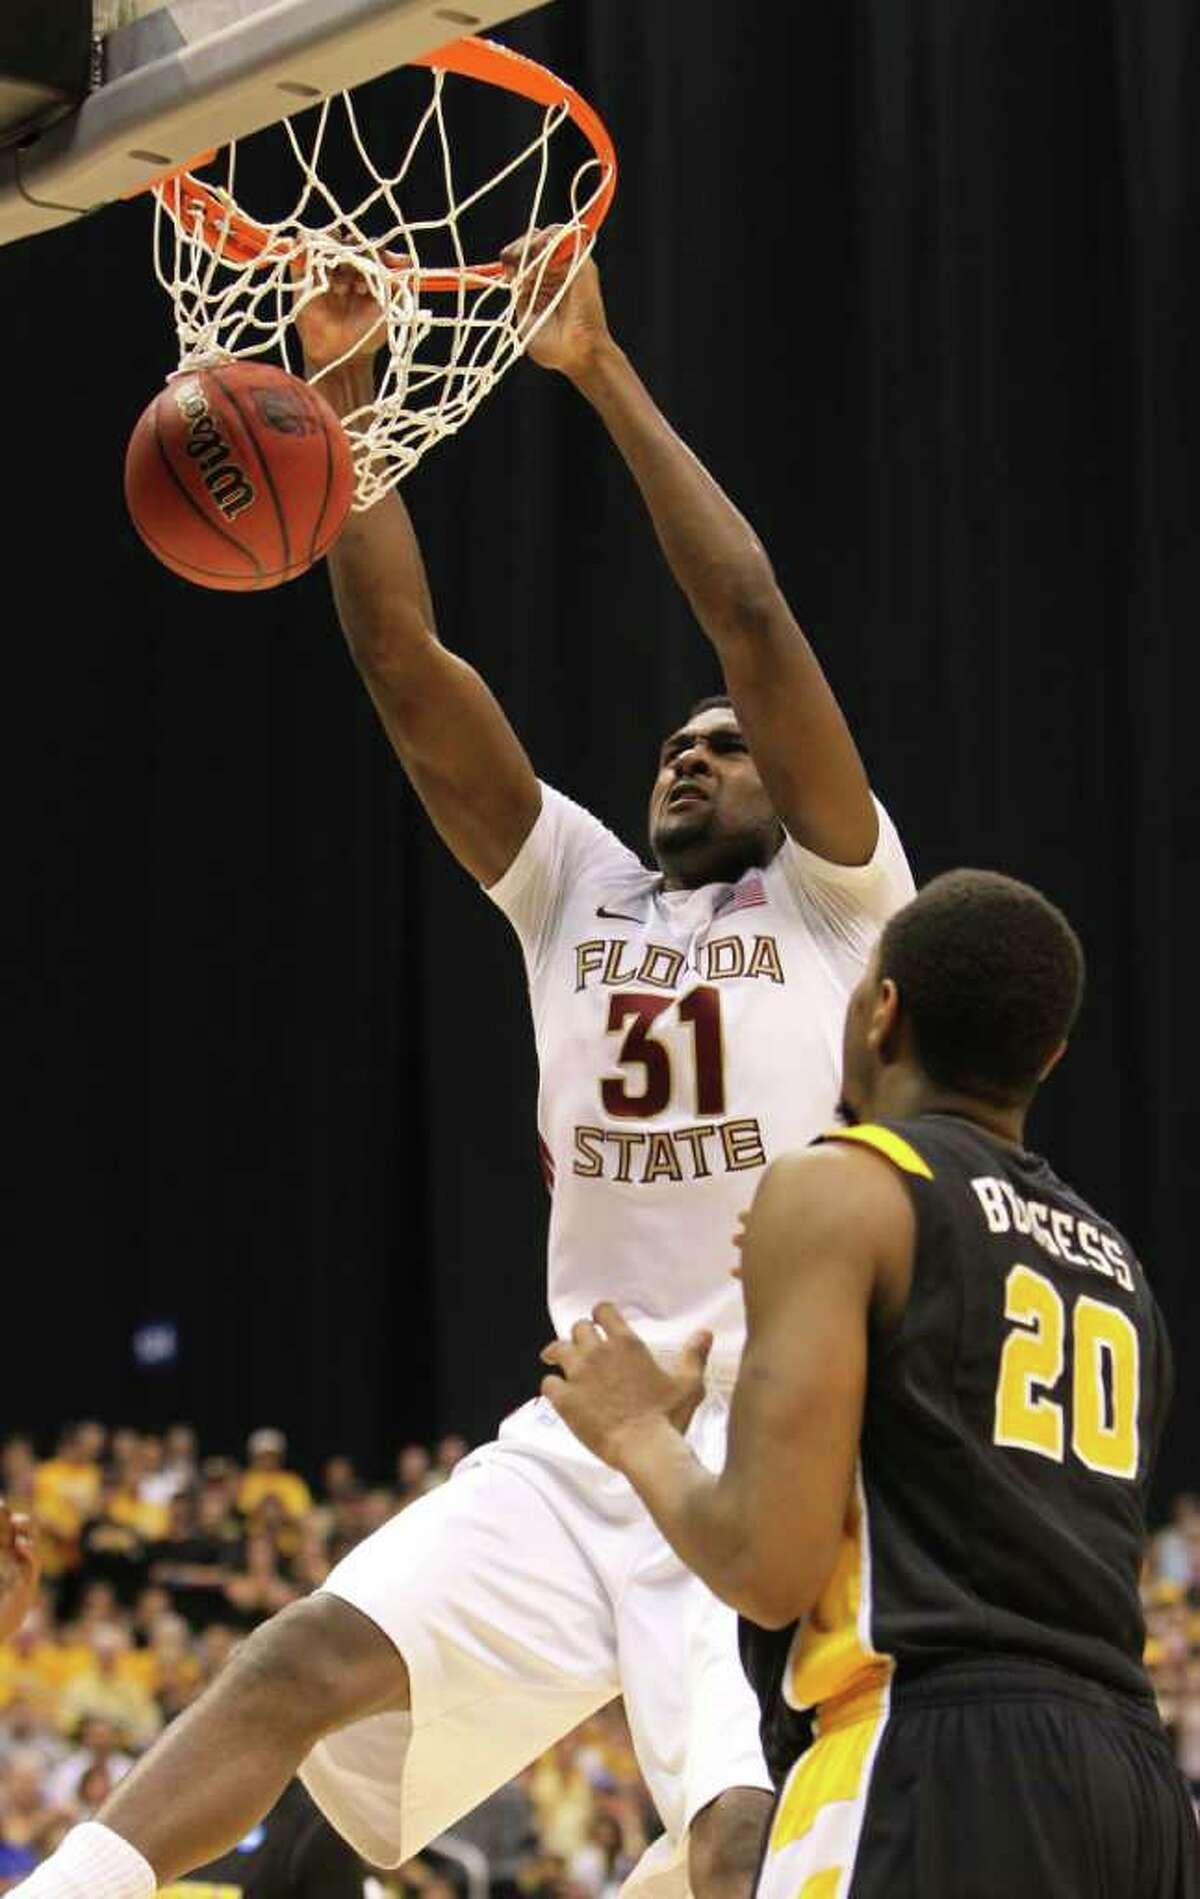 2011 - Chris Singleton, was taken by the Washington Wizards with the No. 18 pick.